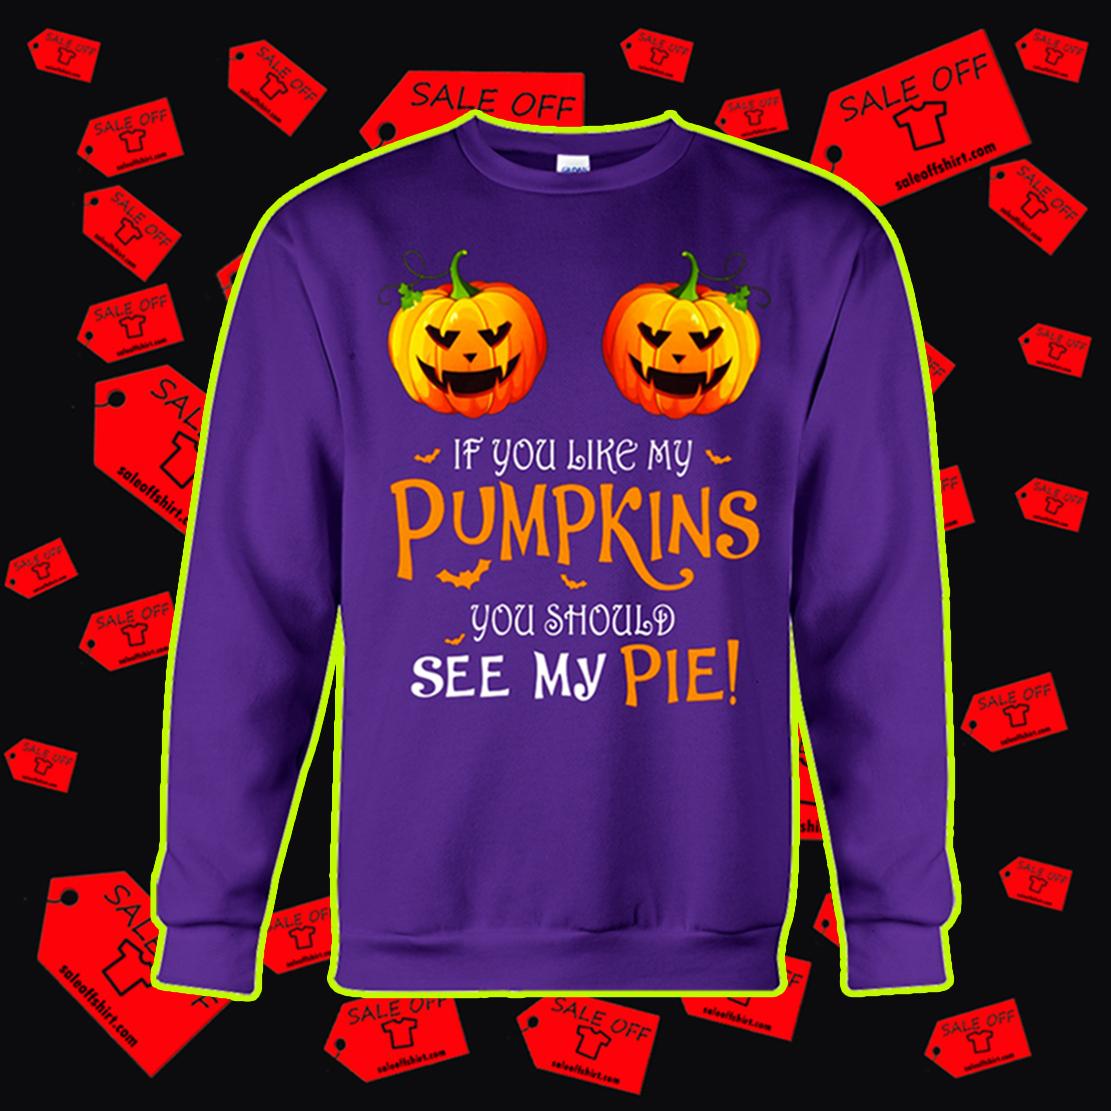 If you like my pumpkins you should see my pie sweatshirt